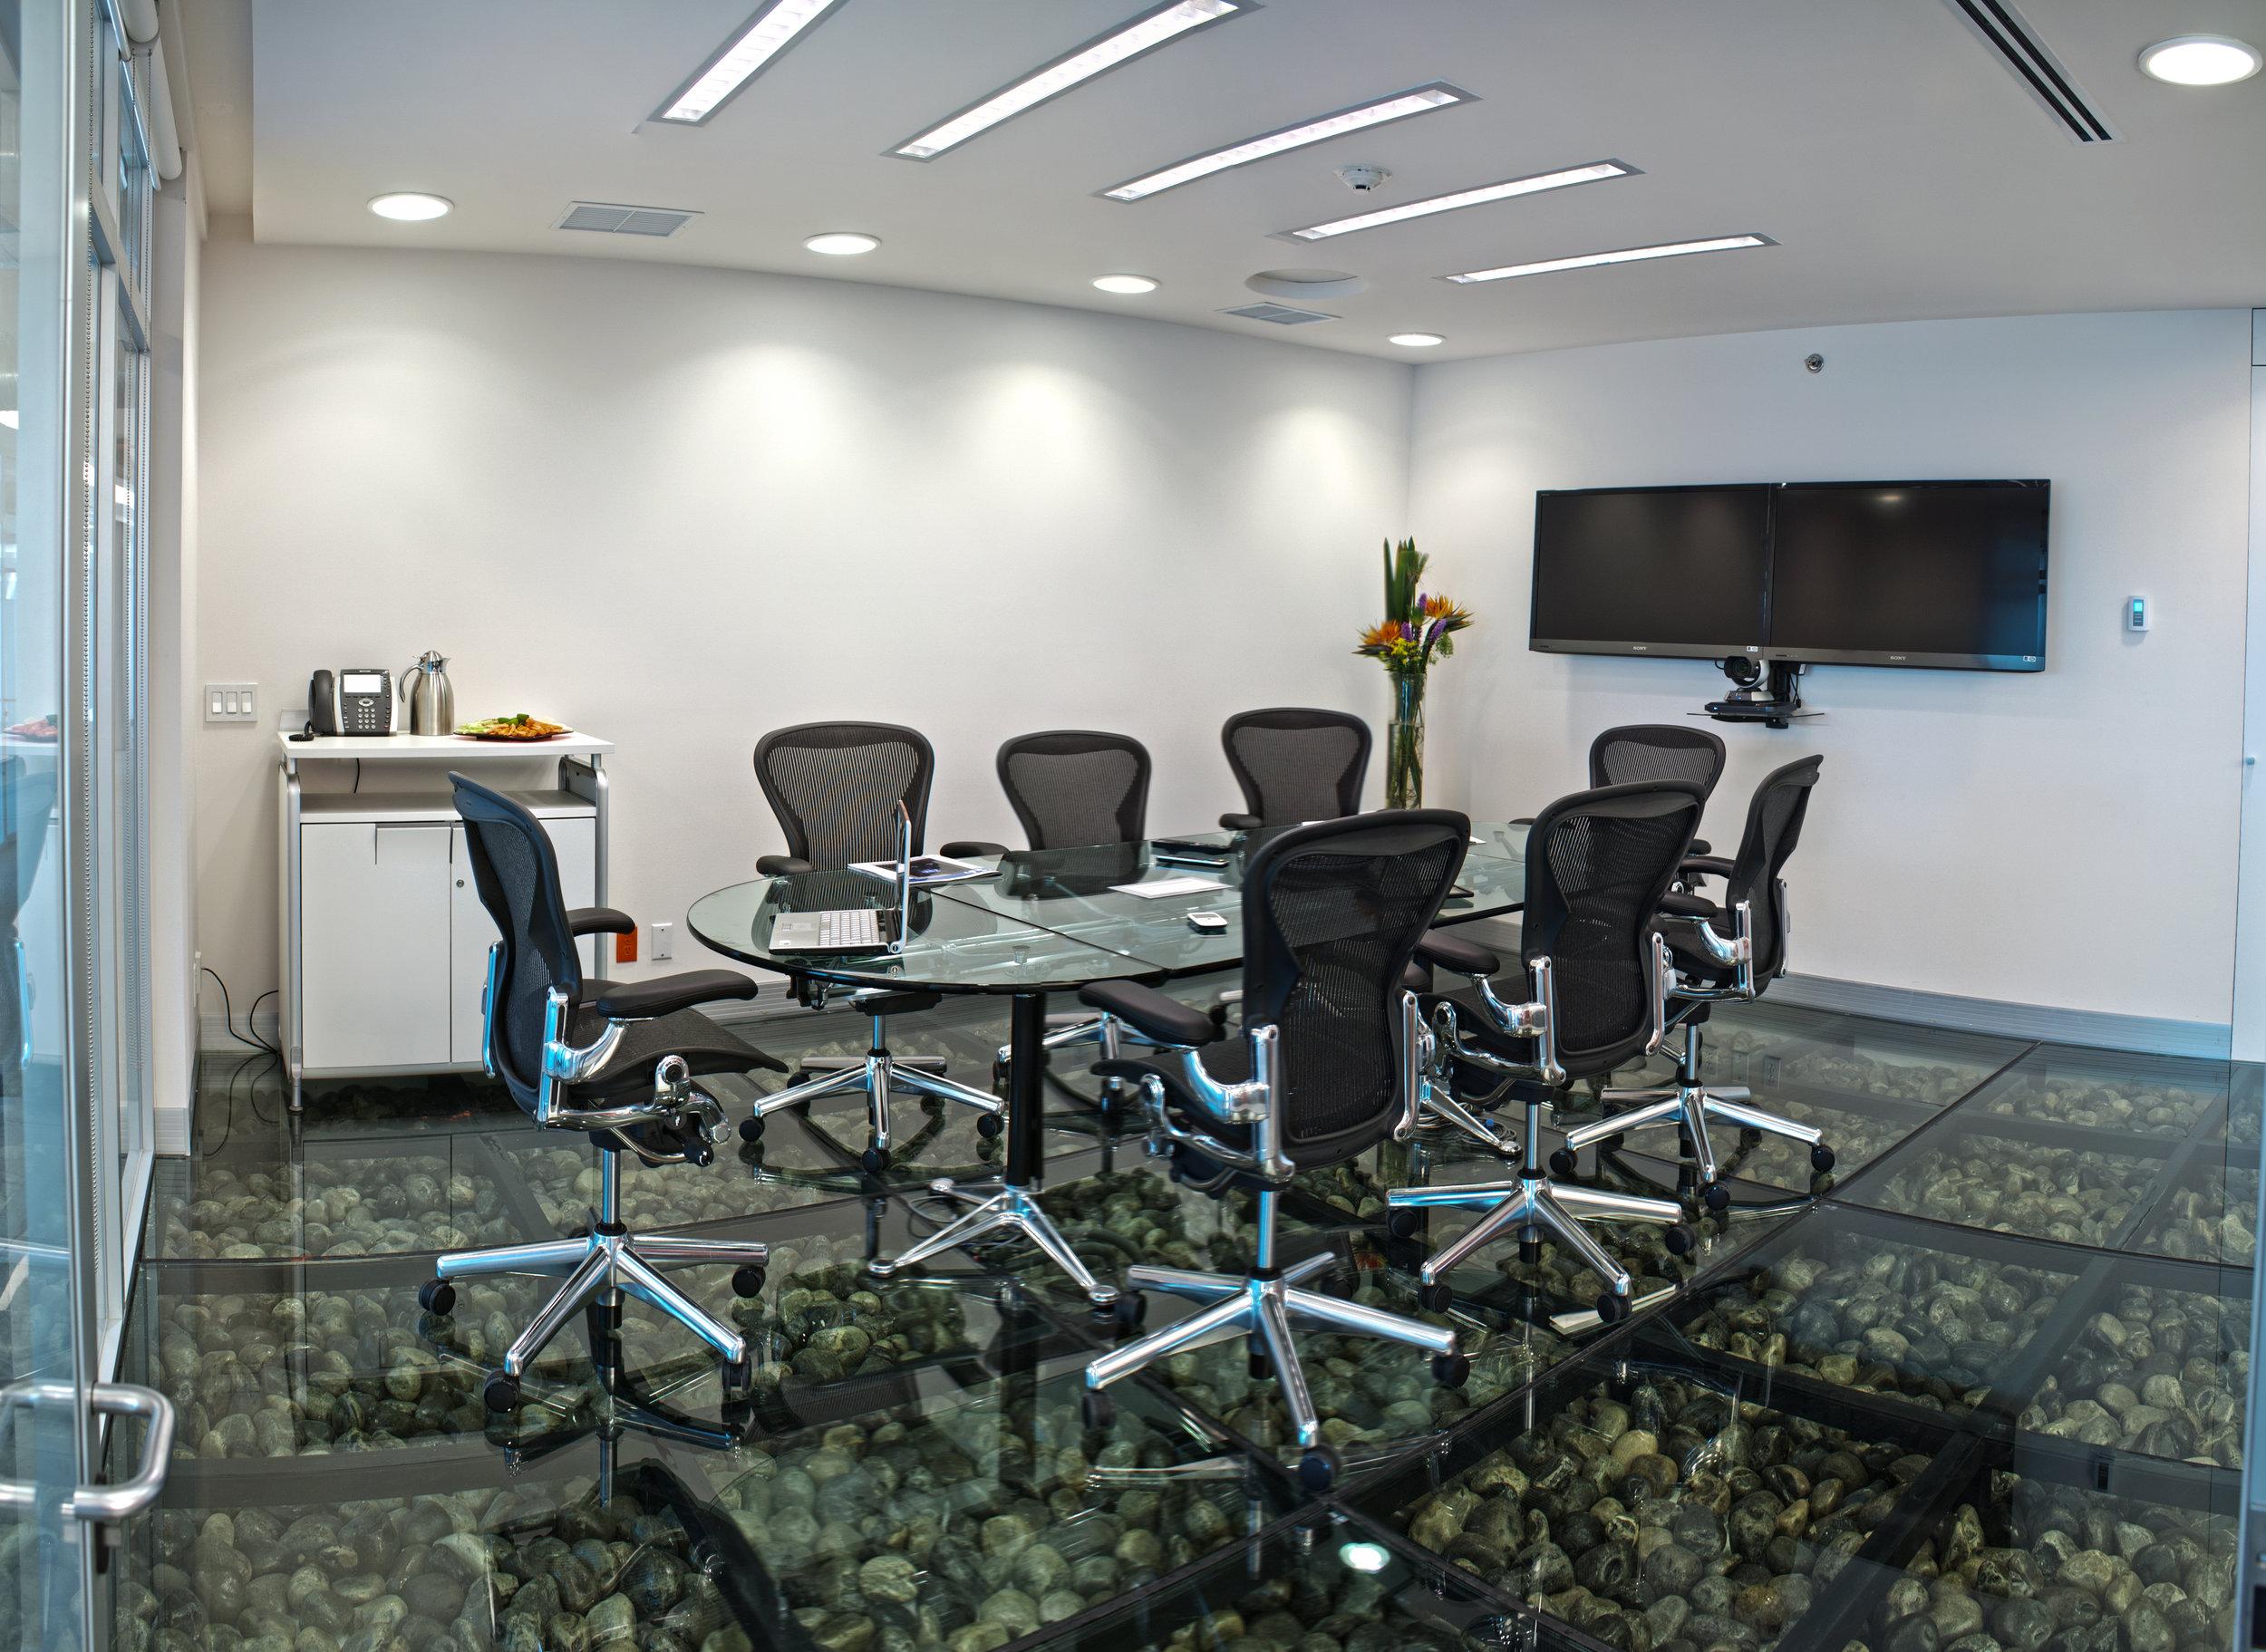 IOS OFFICES INSURGENTES SUR EXECUTIVE ROOM 1.jpg